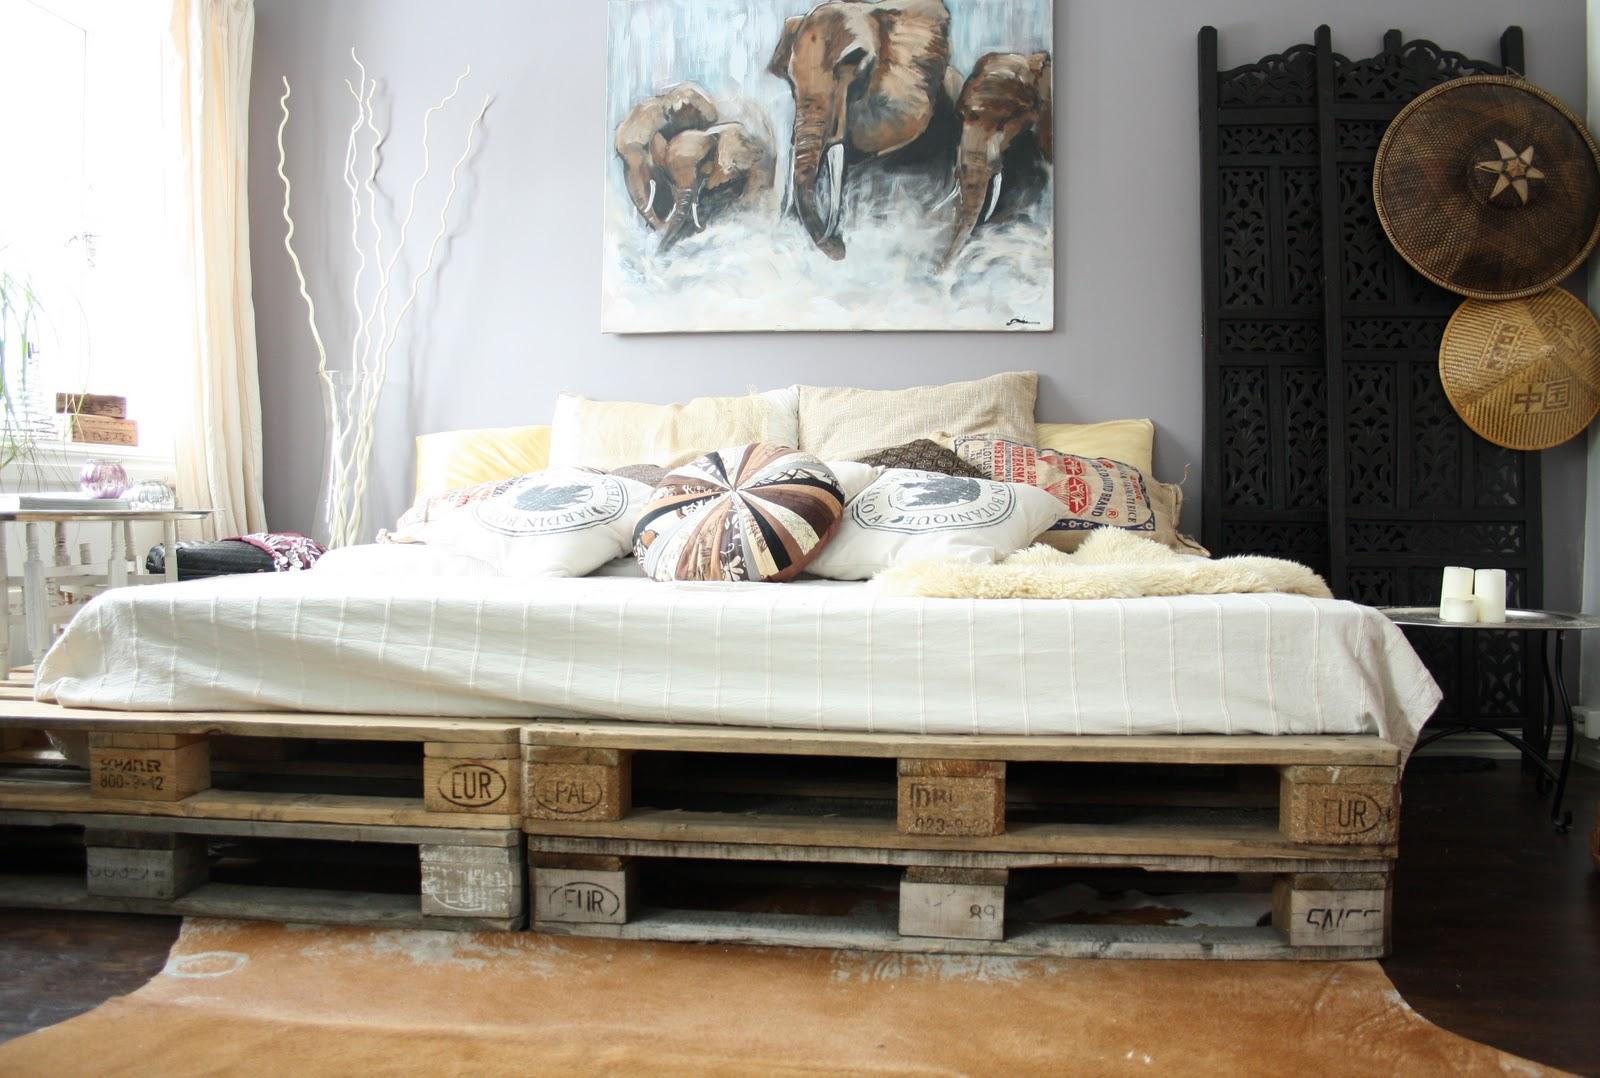 diy-pallet-bed-3